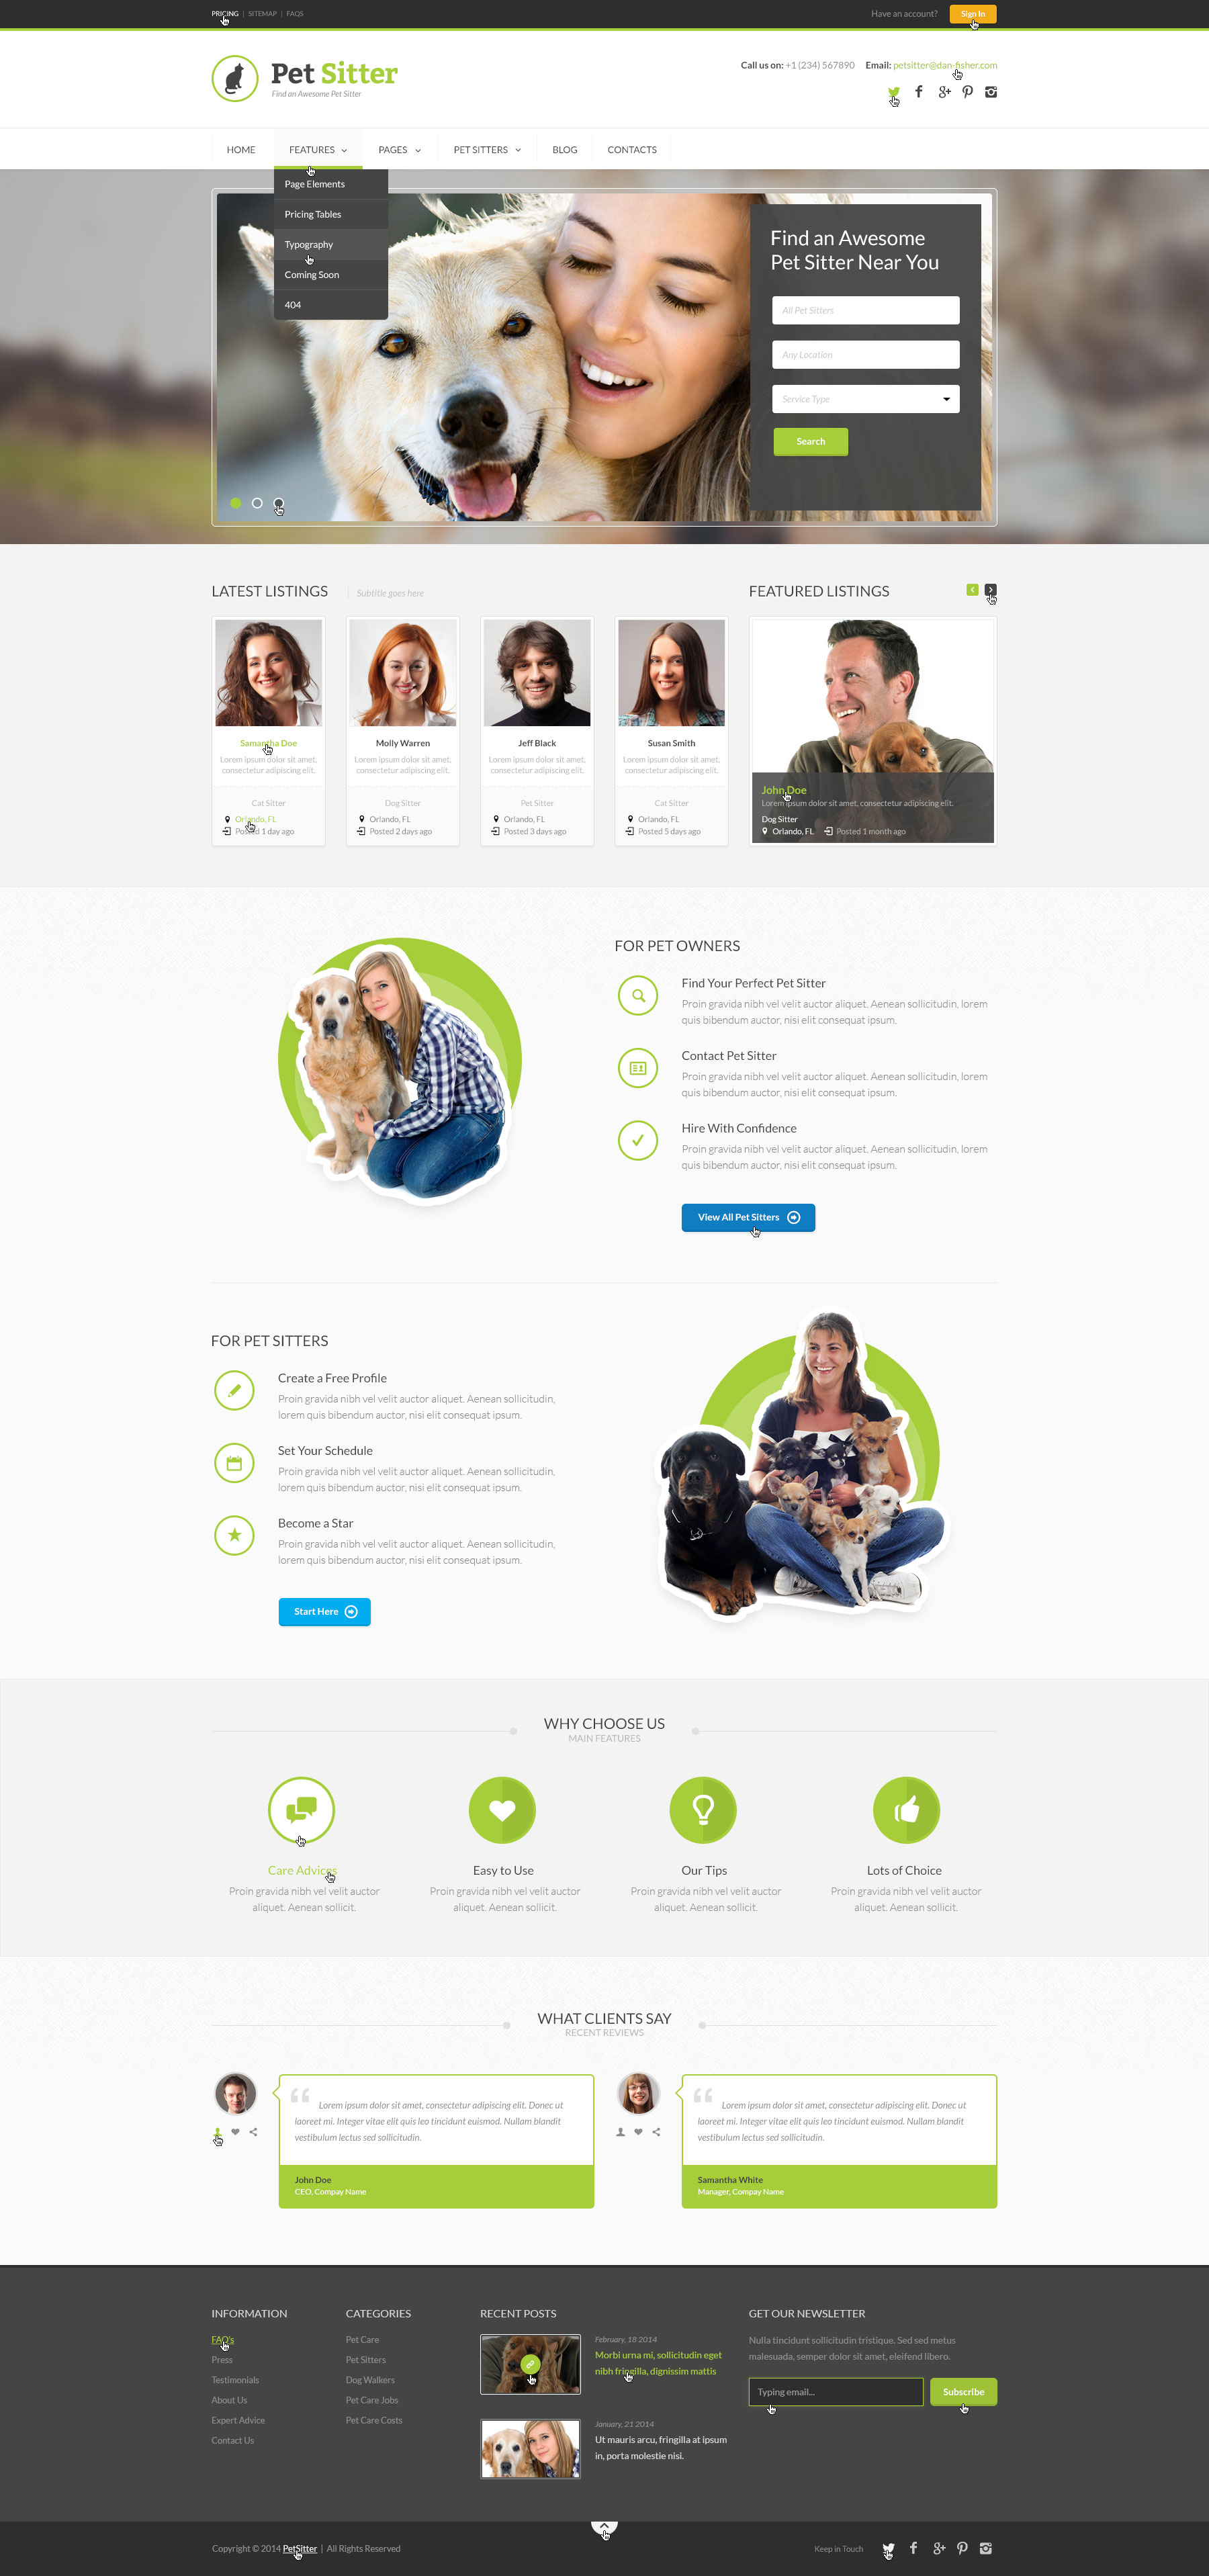 Pet Sitter - Job Board Responsive WordPress Theme by dan_fisher ...